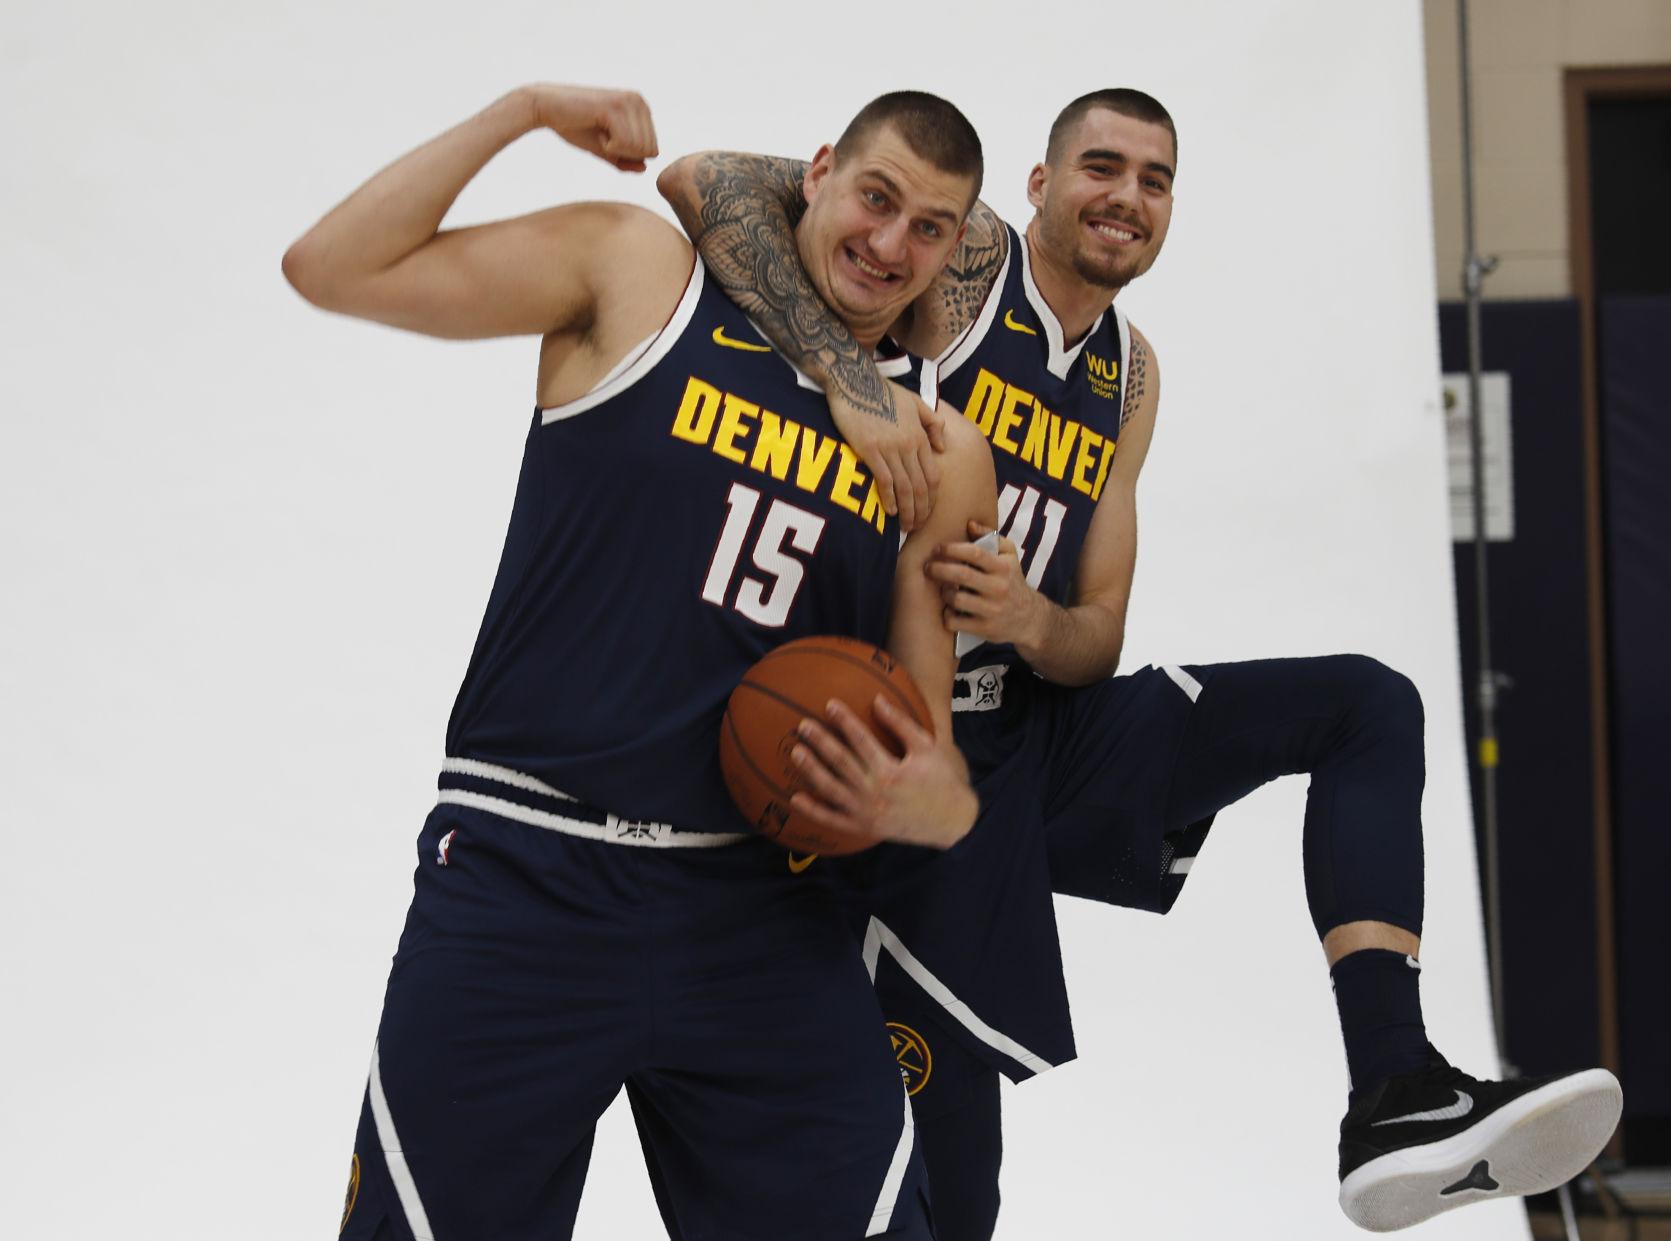 Paul Klee: How do Denver Nuggets challenge for NBA title